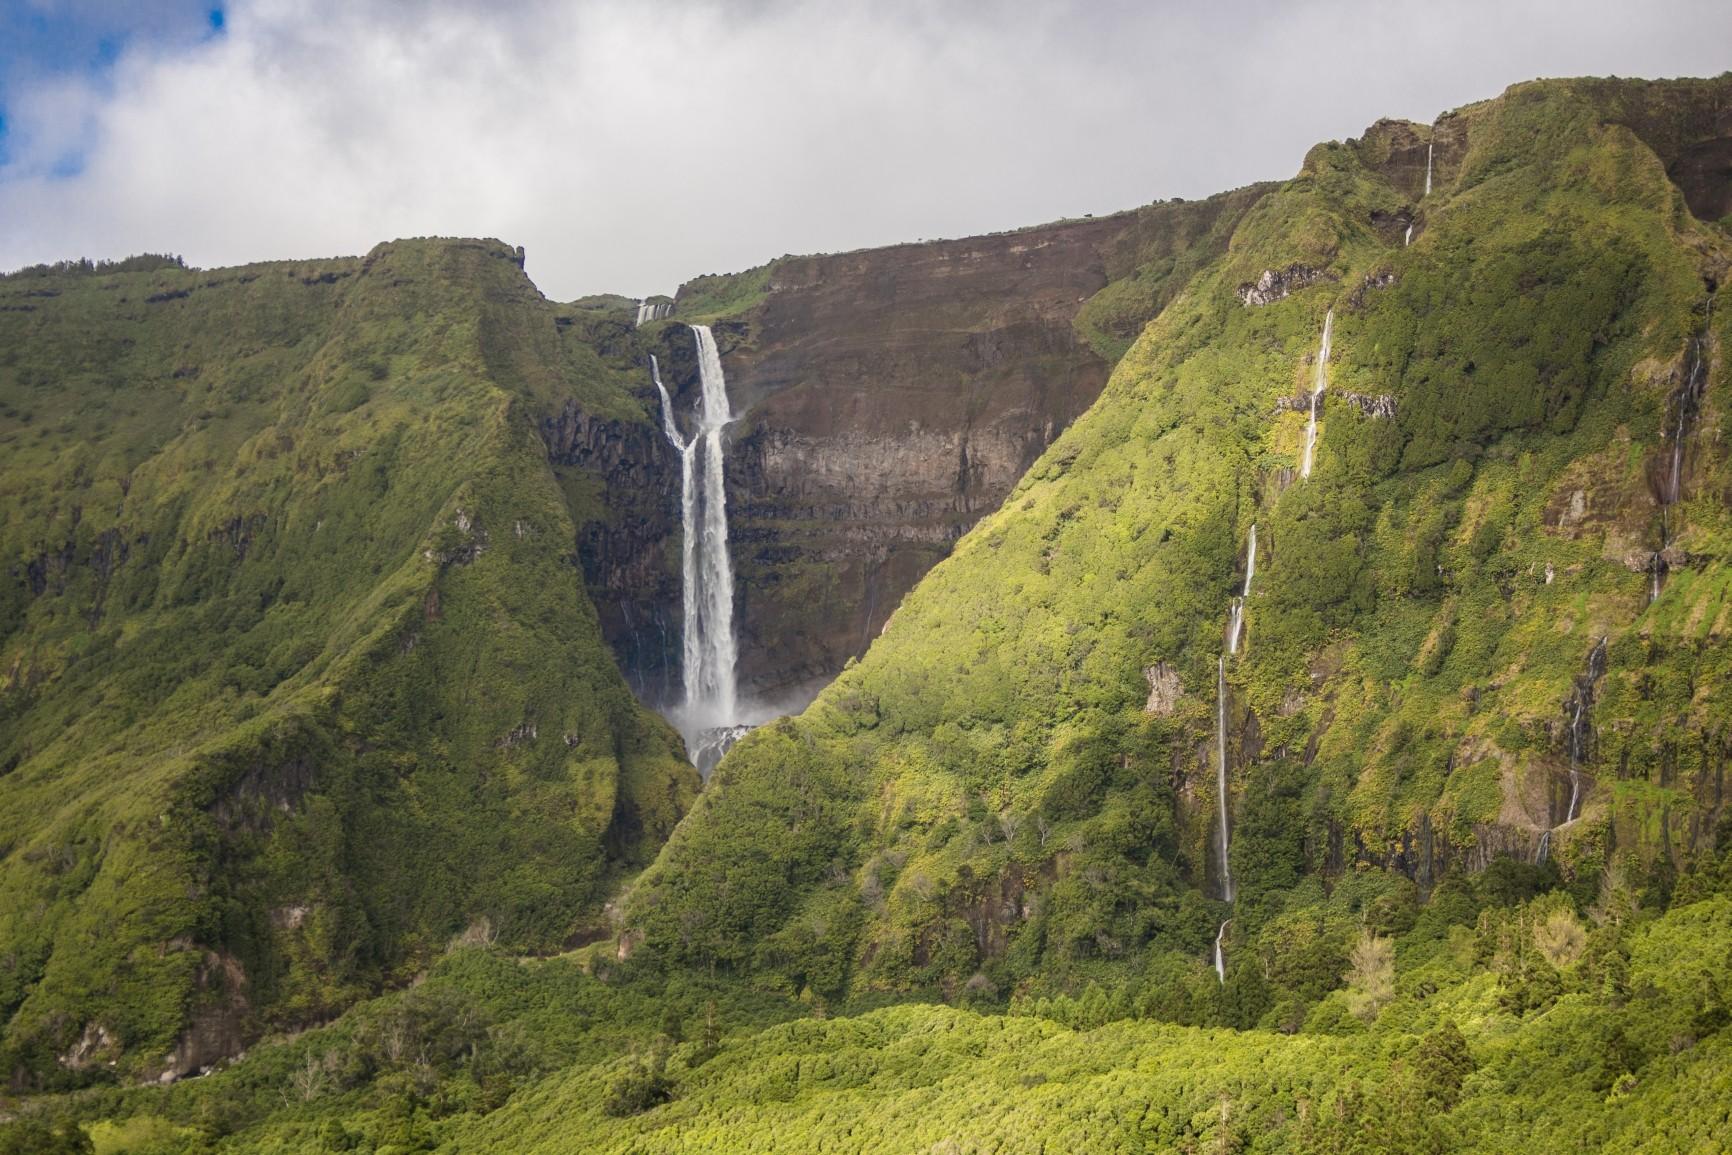 Flores - Wasserfälle des Ribeira do Ferreiro